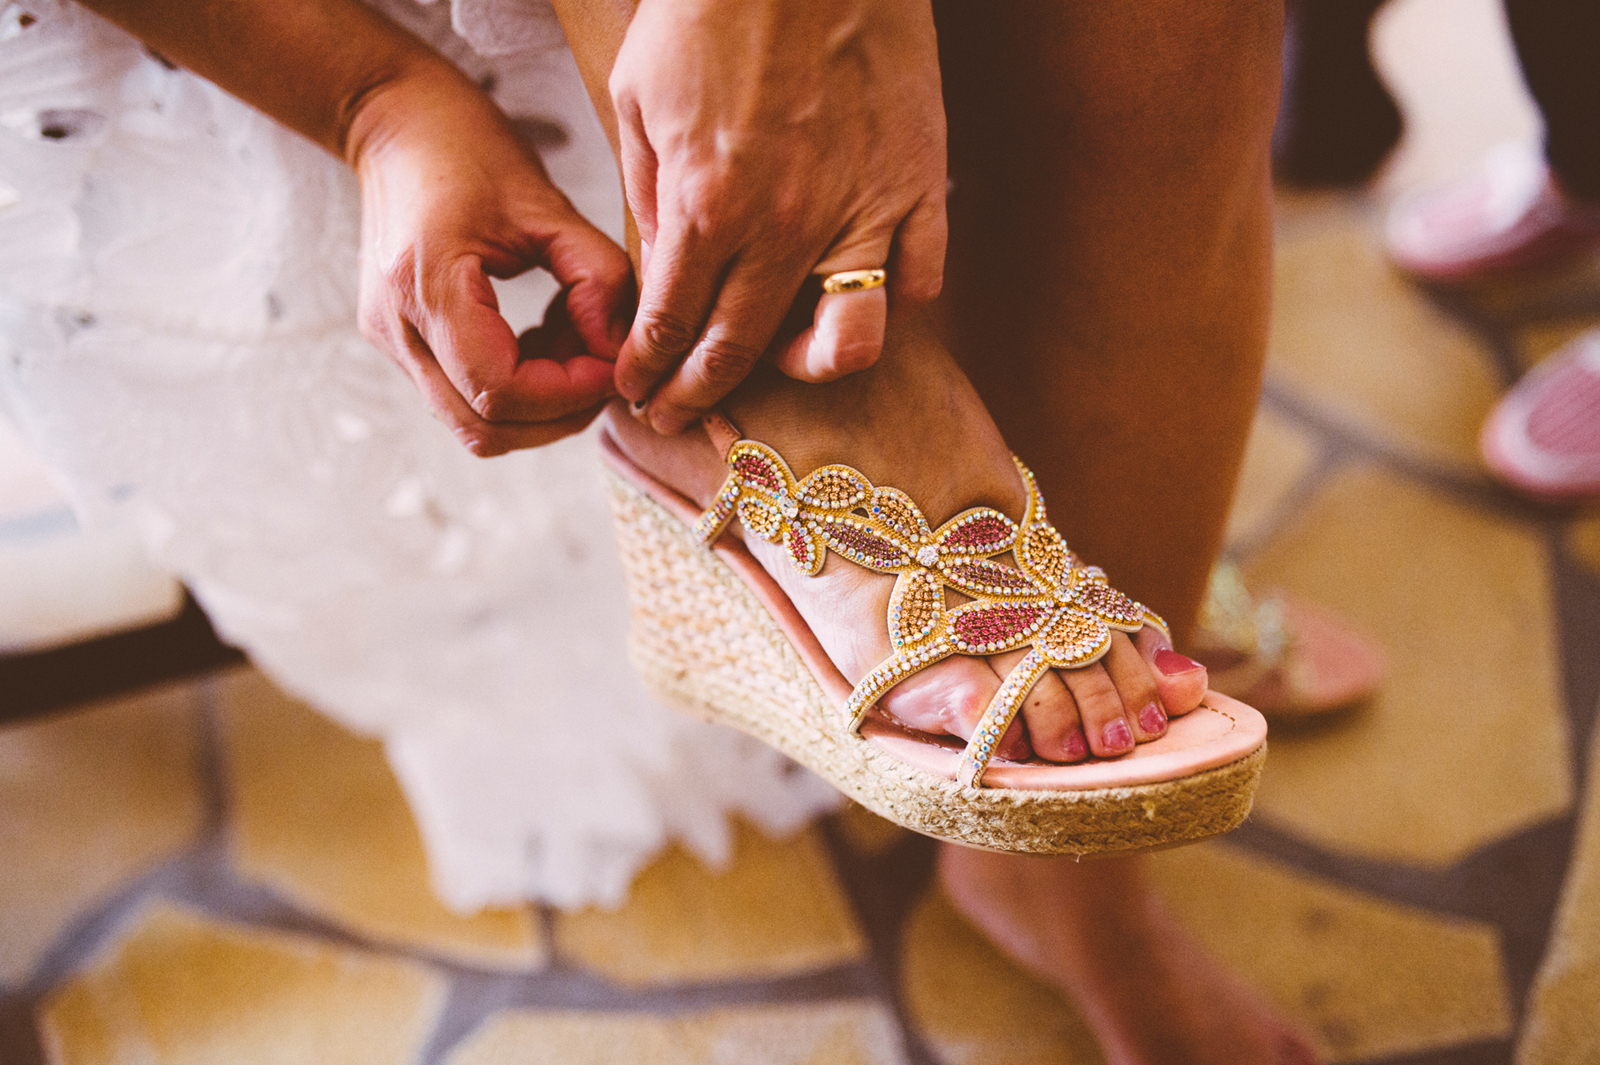 Hochzeitsfotograf_Ibiza_065.jpg